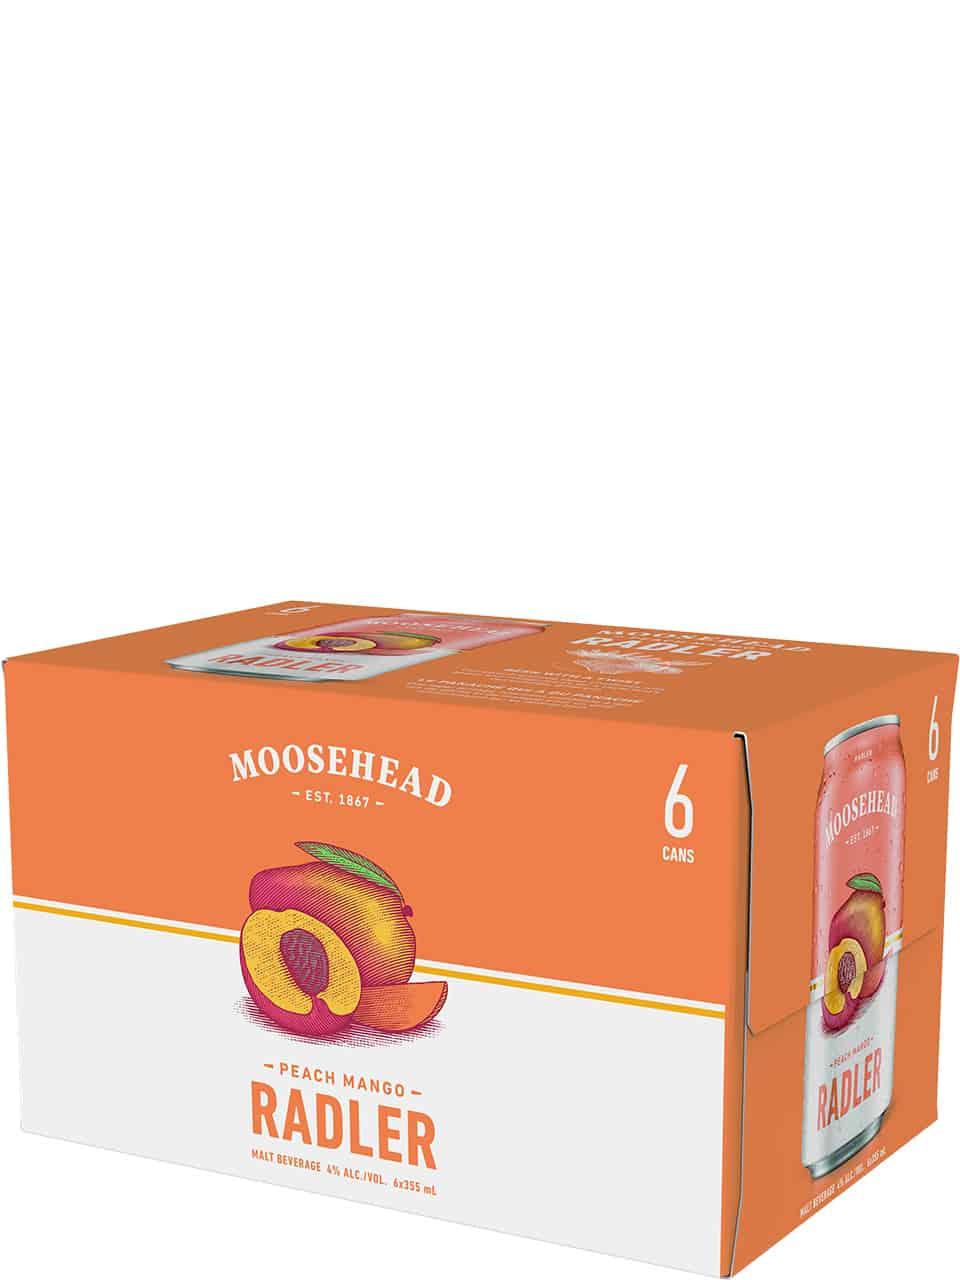 Moosehead Radler Peach Mango 6 Pack Cans